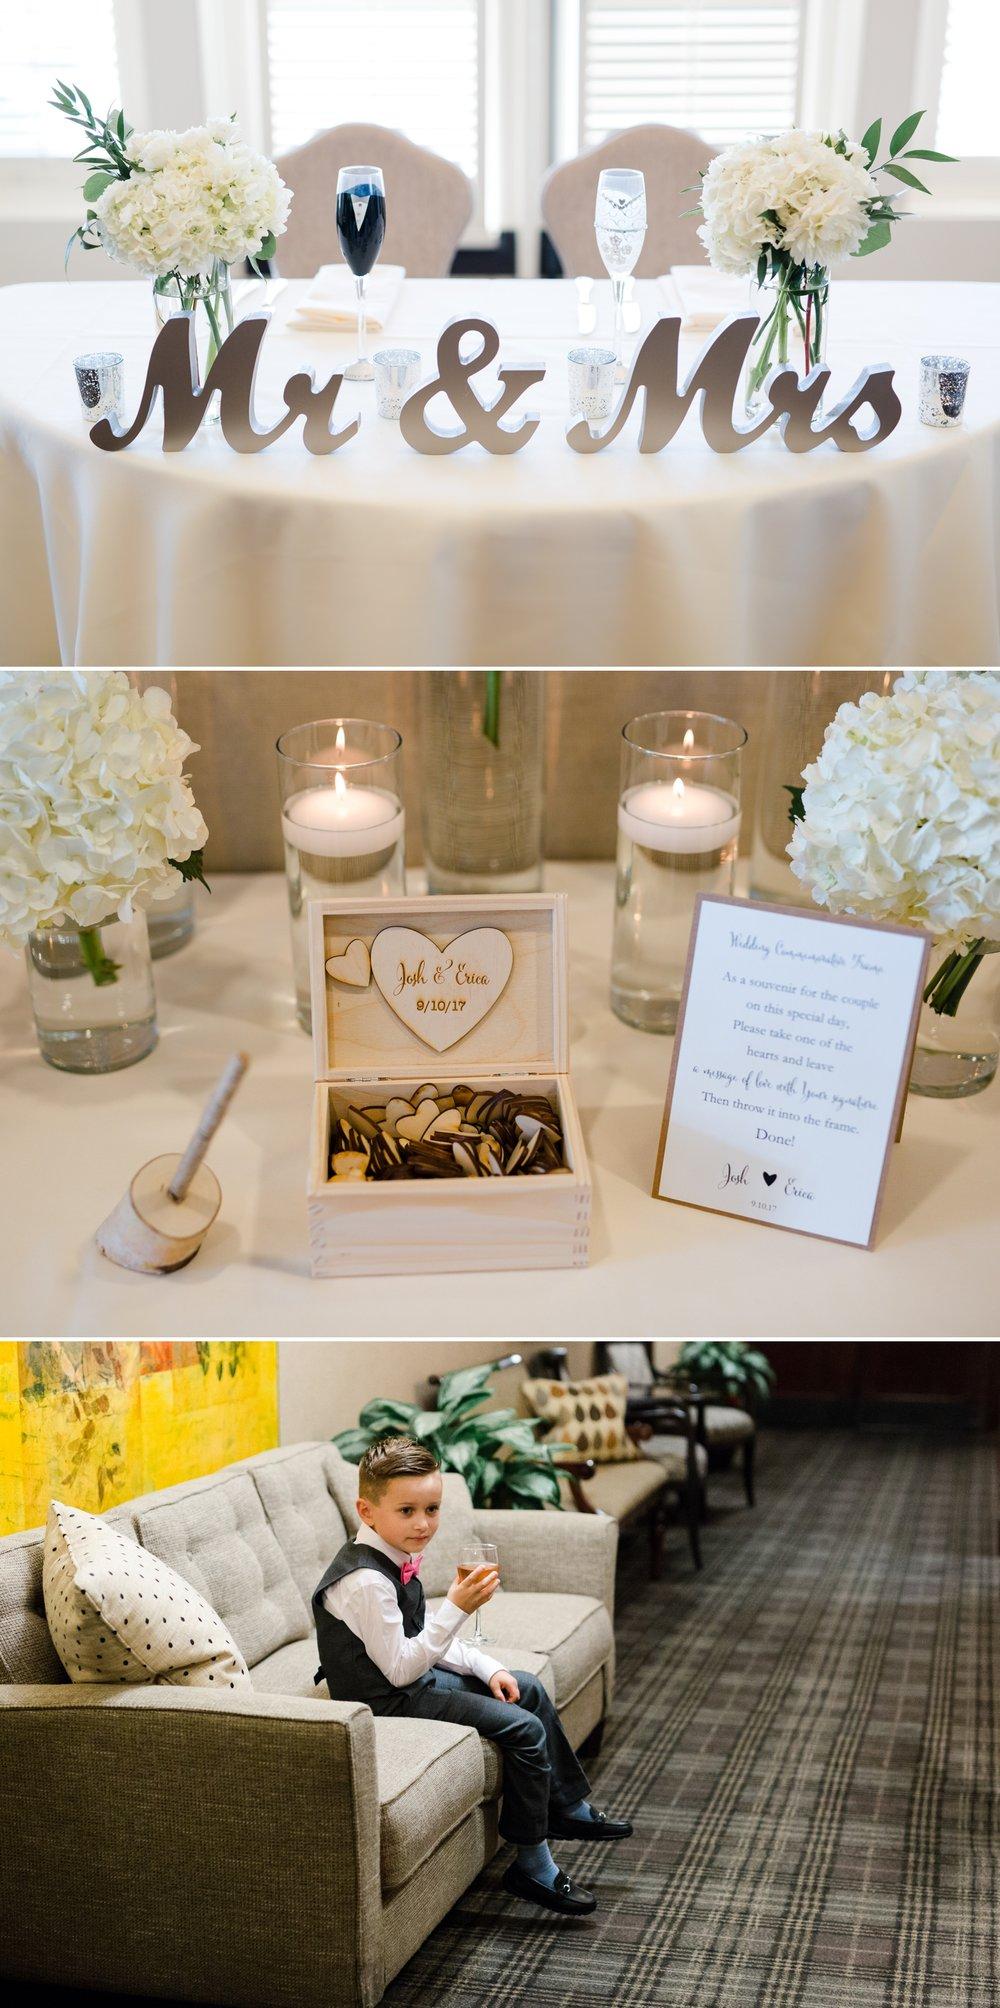 28-seattle-wedding-reception-venue.jpg